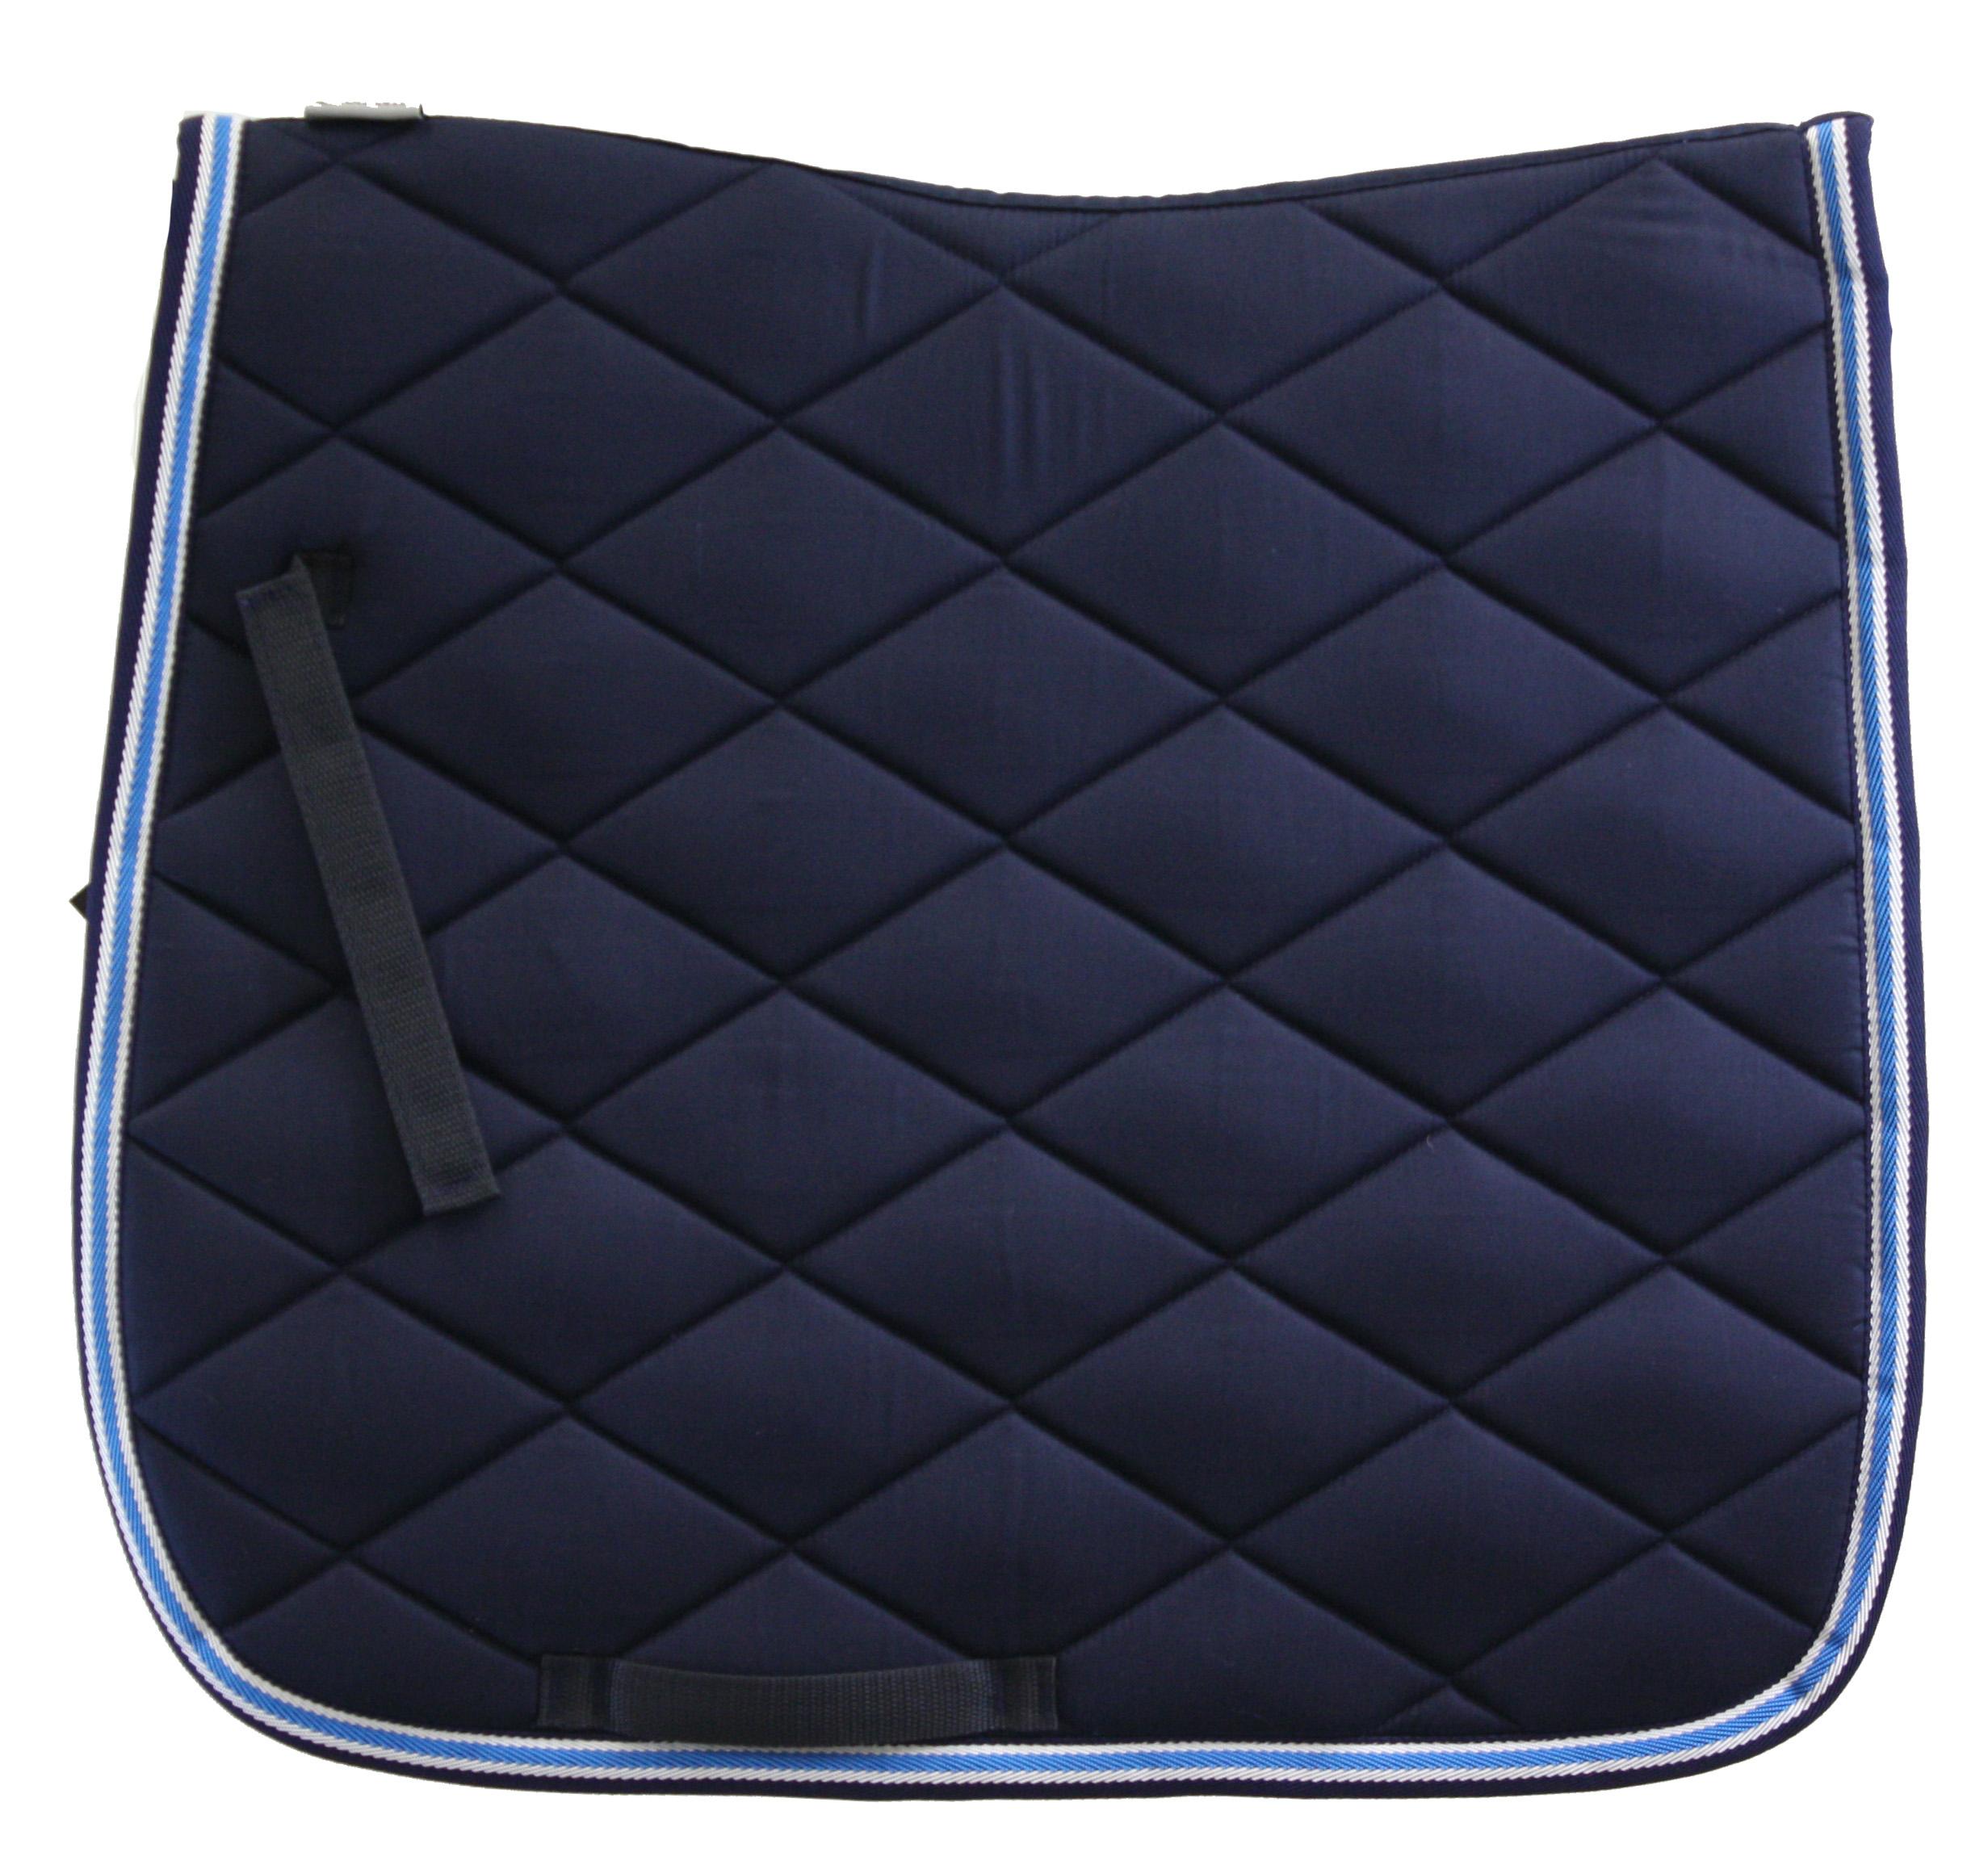 Lami-Cell Diamond Dressage Saddle Pad